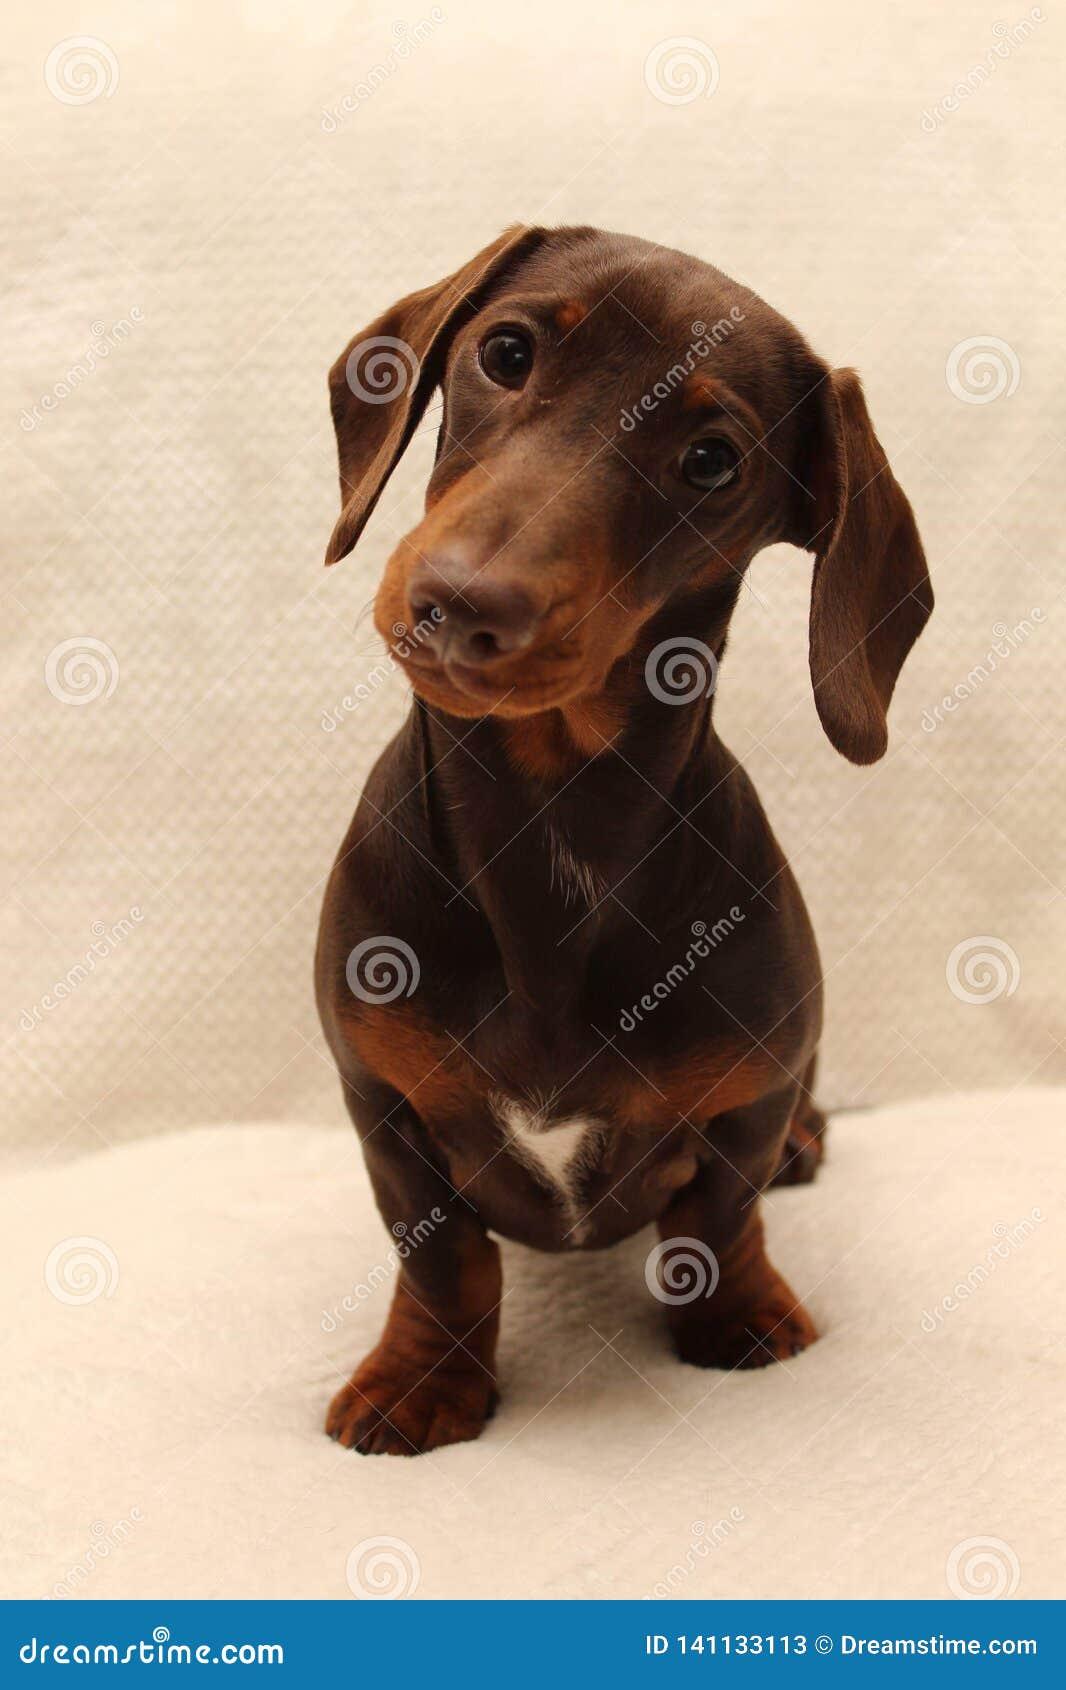 Chocolate Miniature Dachshund Puppy Stock Image Image Of Sausage Side 141133113